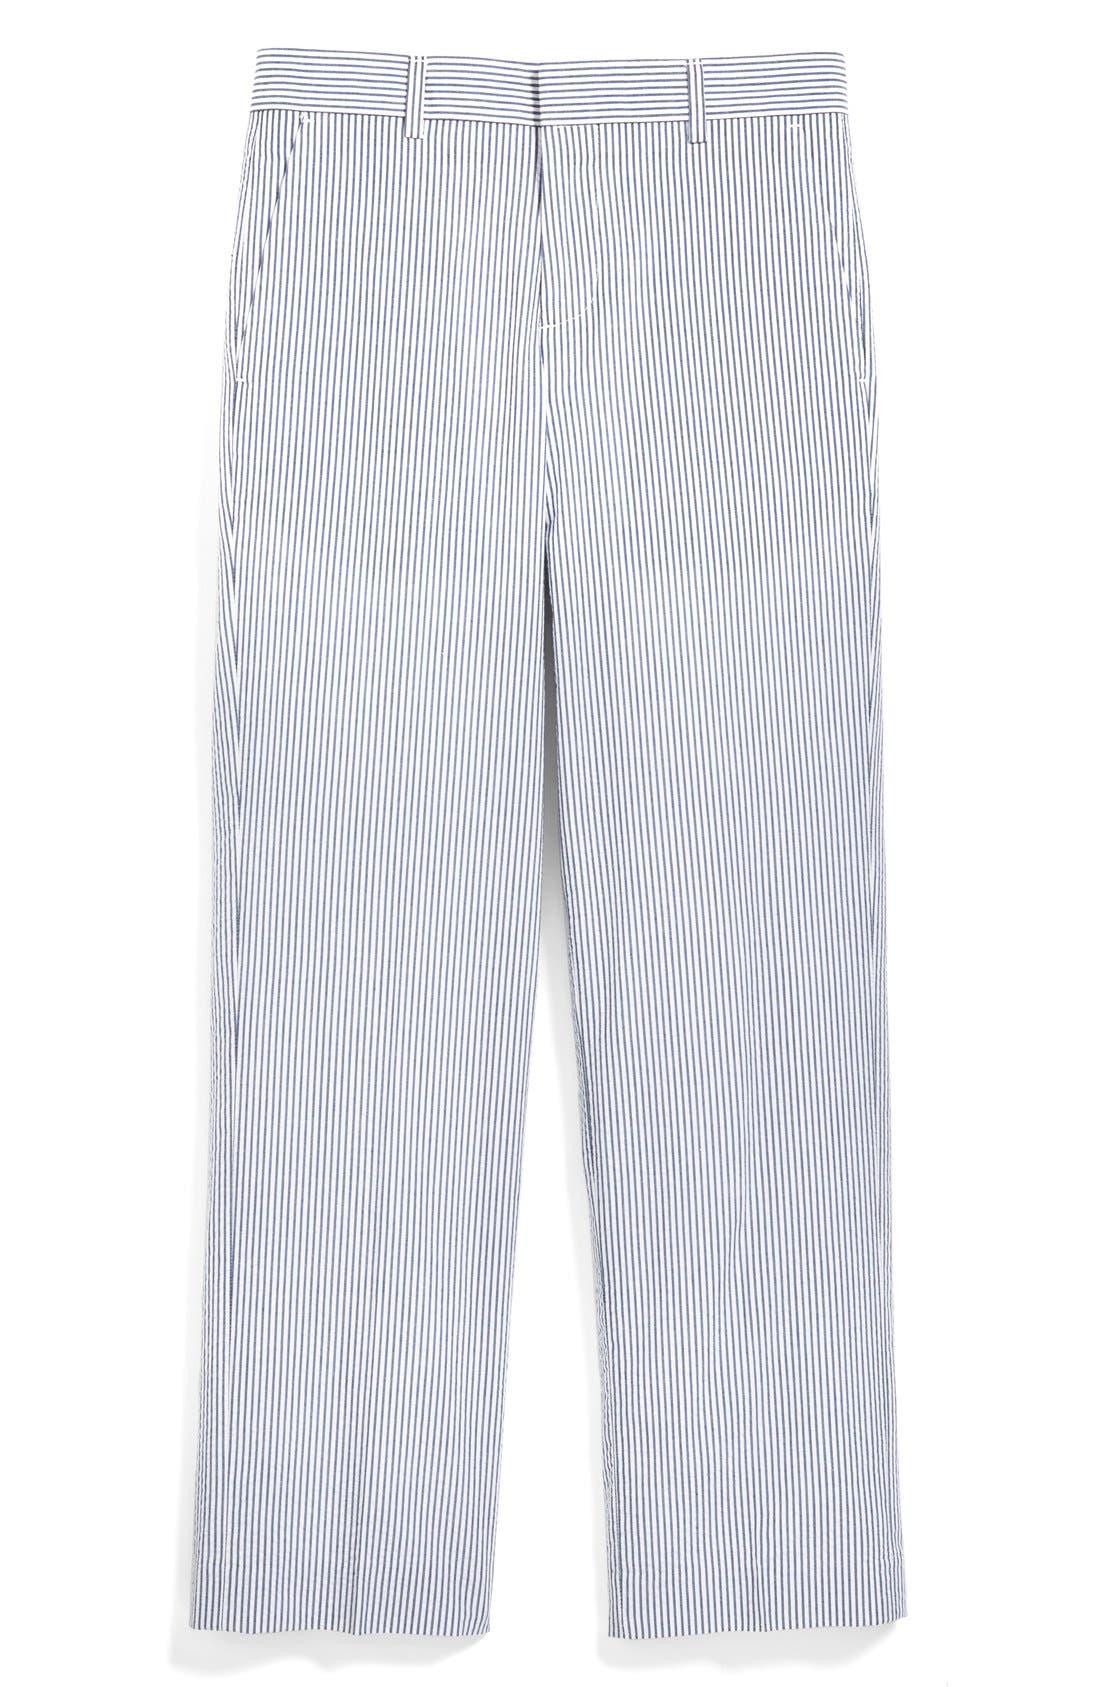 Main Image - Nordstrom 'Quentin' Seersucker Trousers (Toddler Boys, Little Boys & Big Boys)